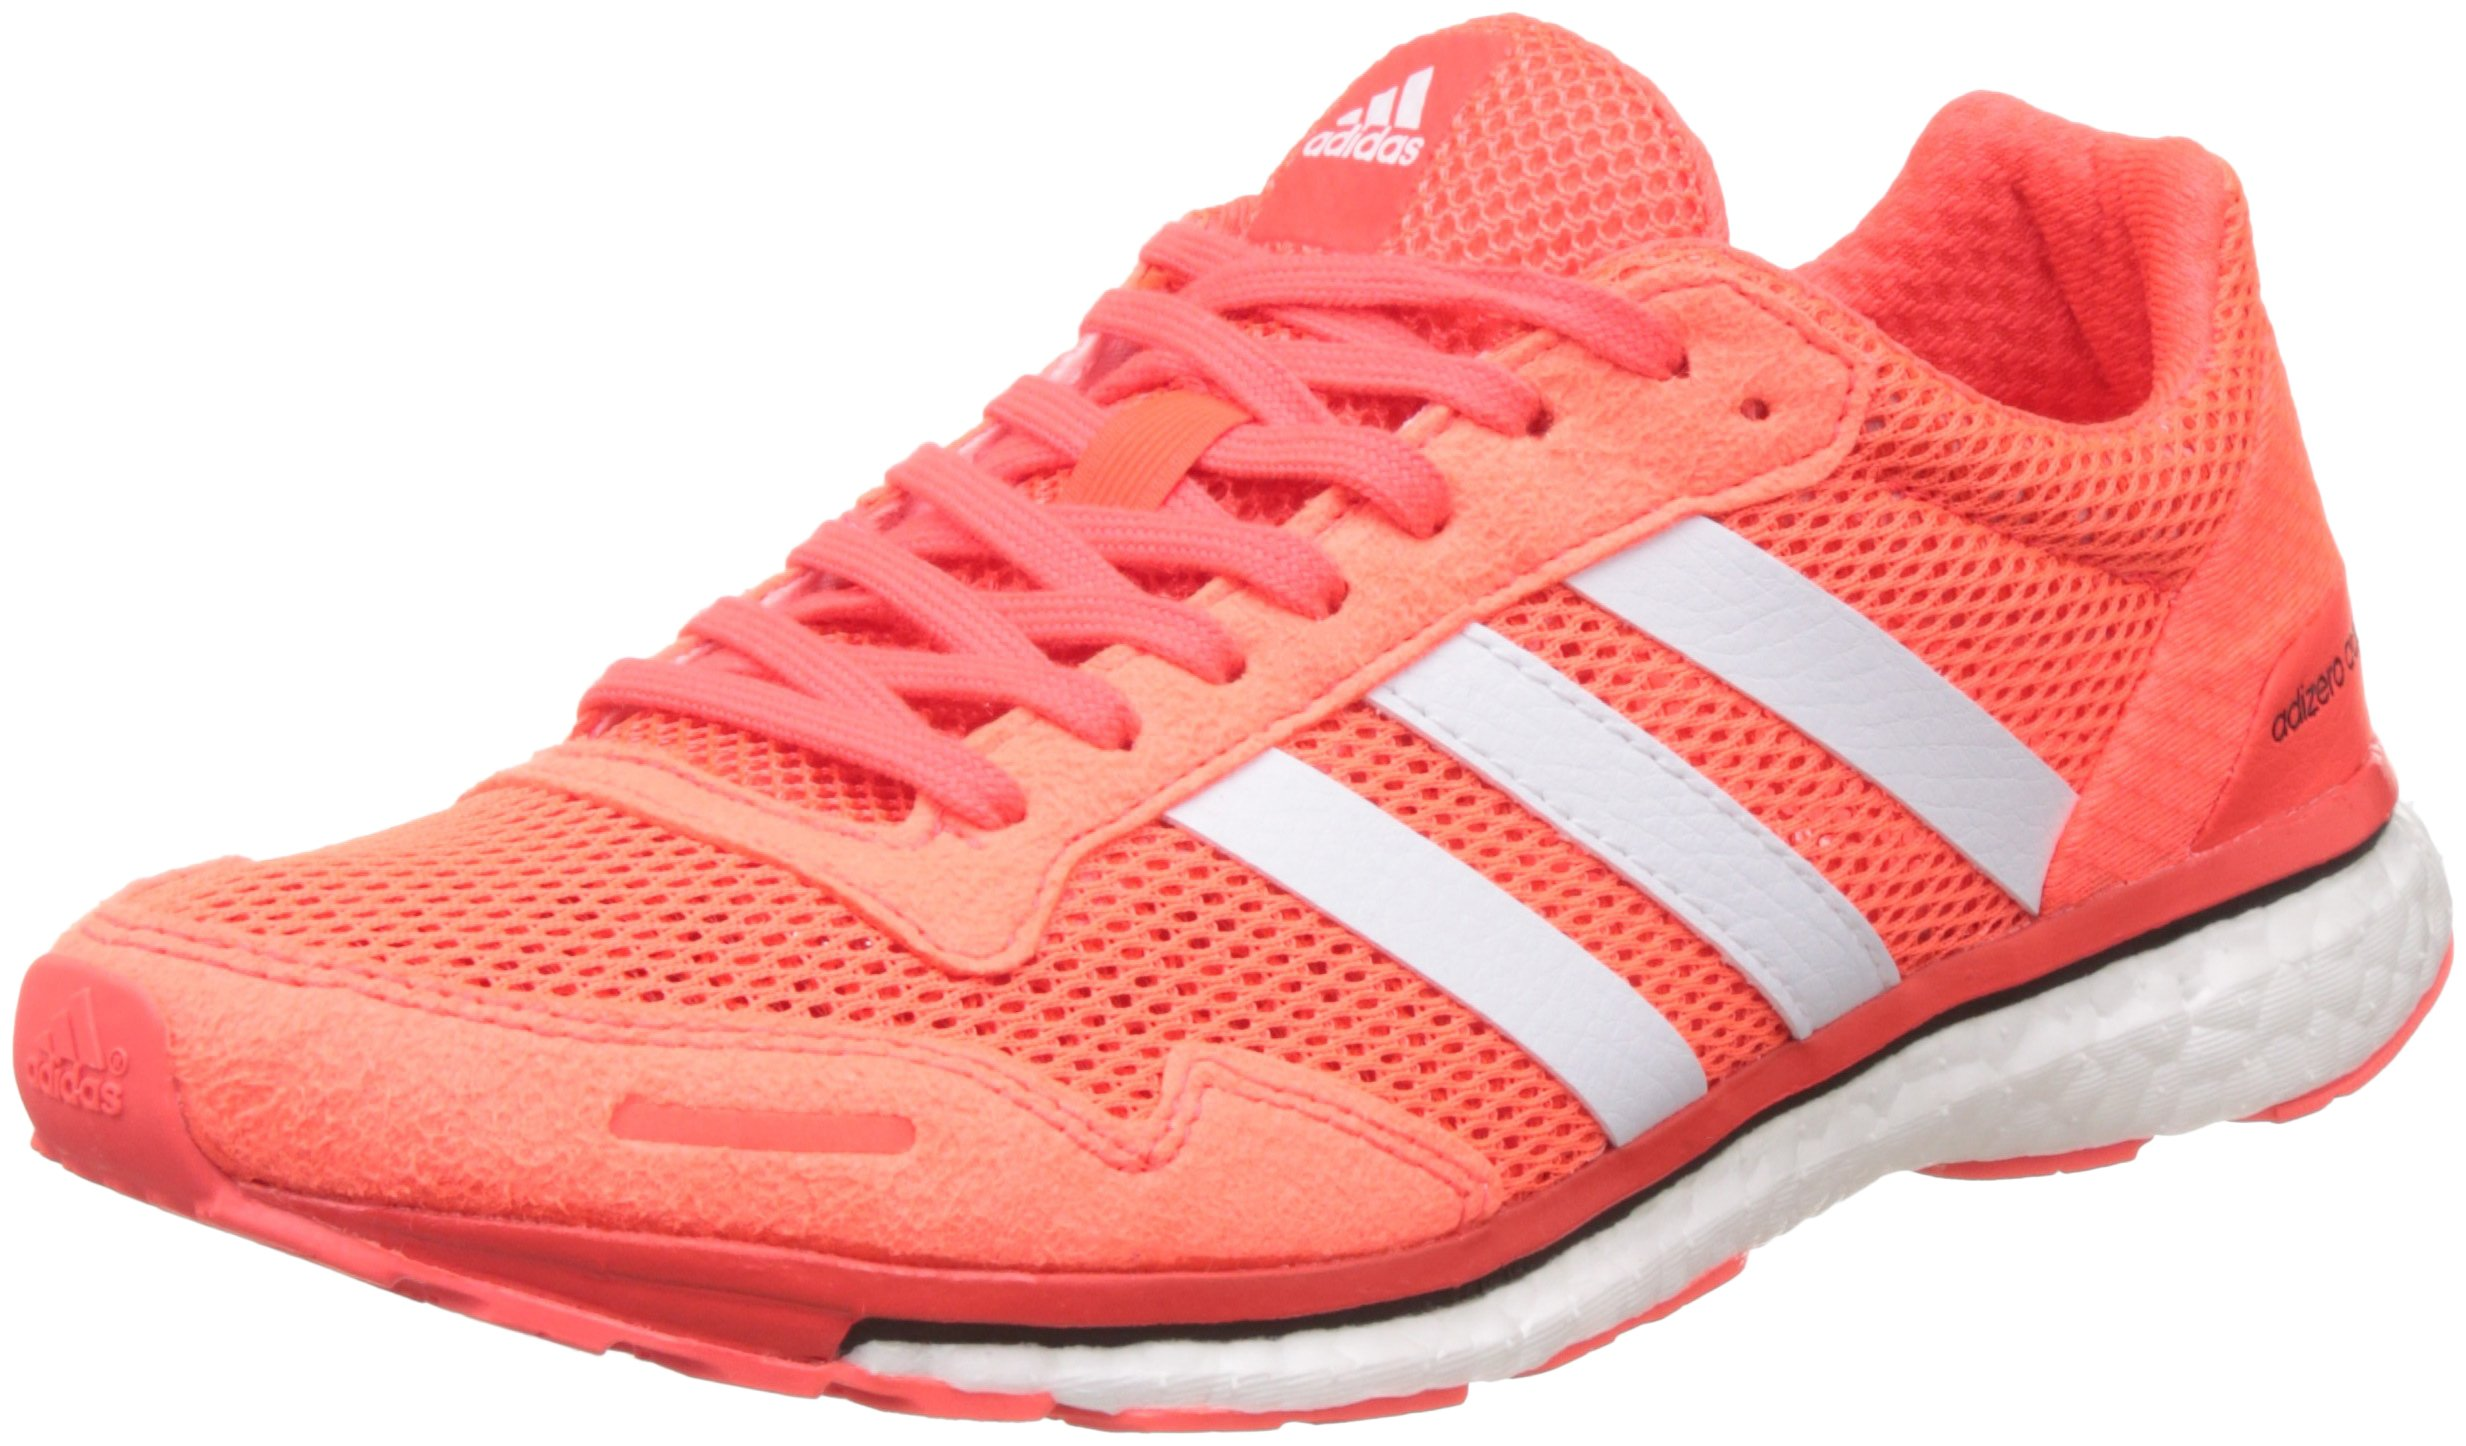 Running 5 Shoes Orange 5 Adidas Adios Adizero 3 Women's rdBCxoe